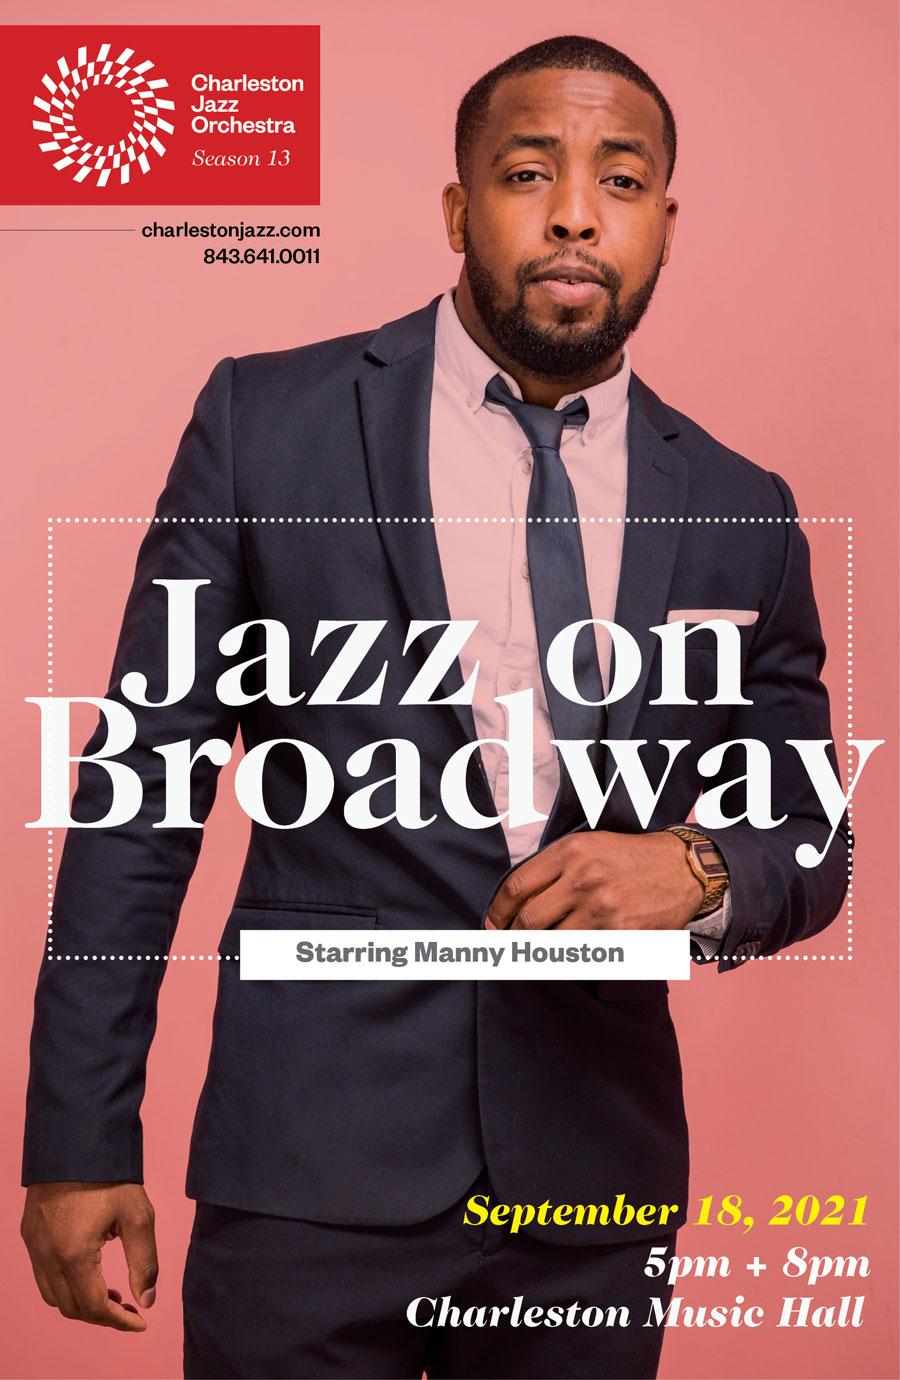 Jazz on Broadway with Manny Houston